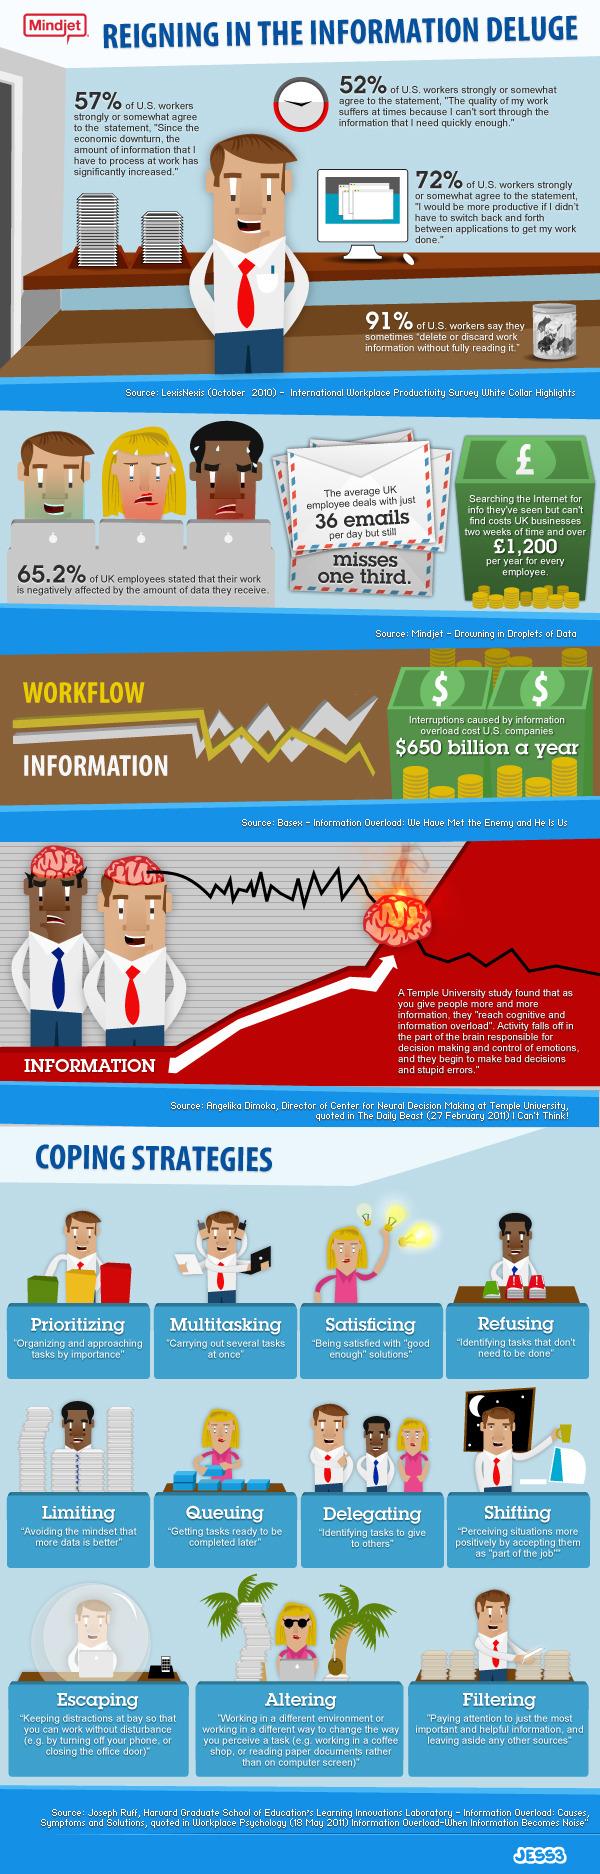 Mindjet-worker-overload-infographic